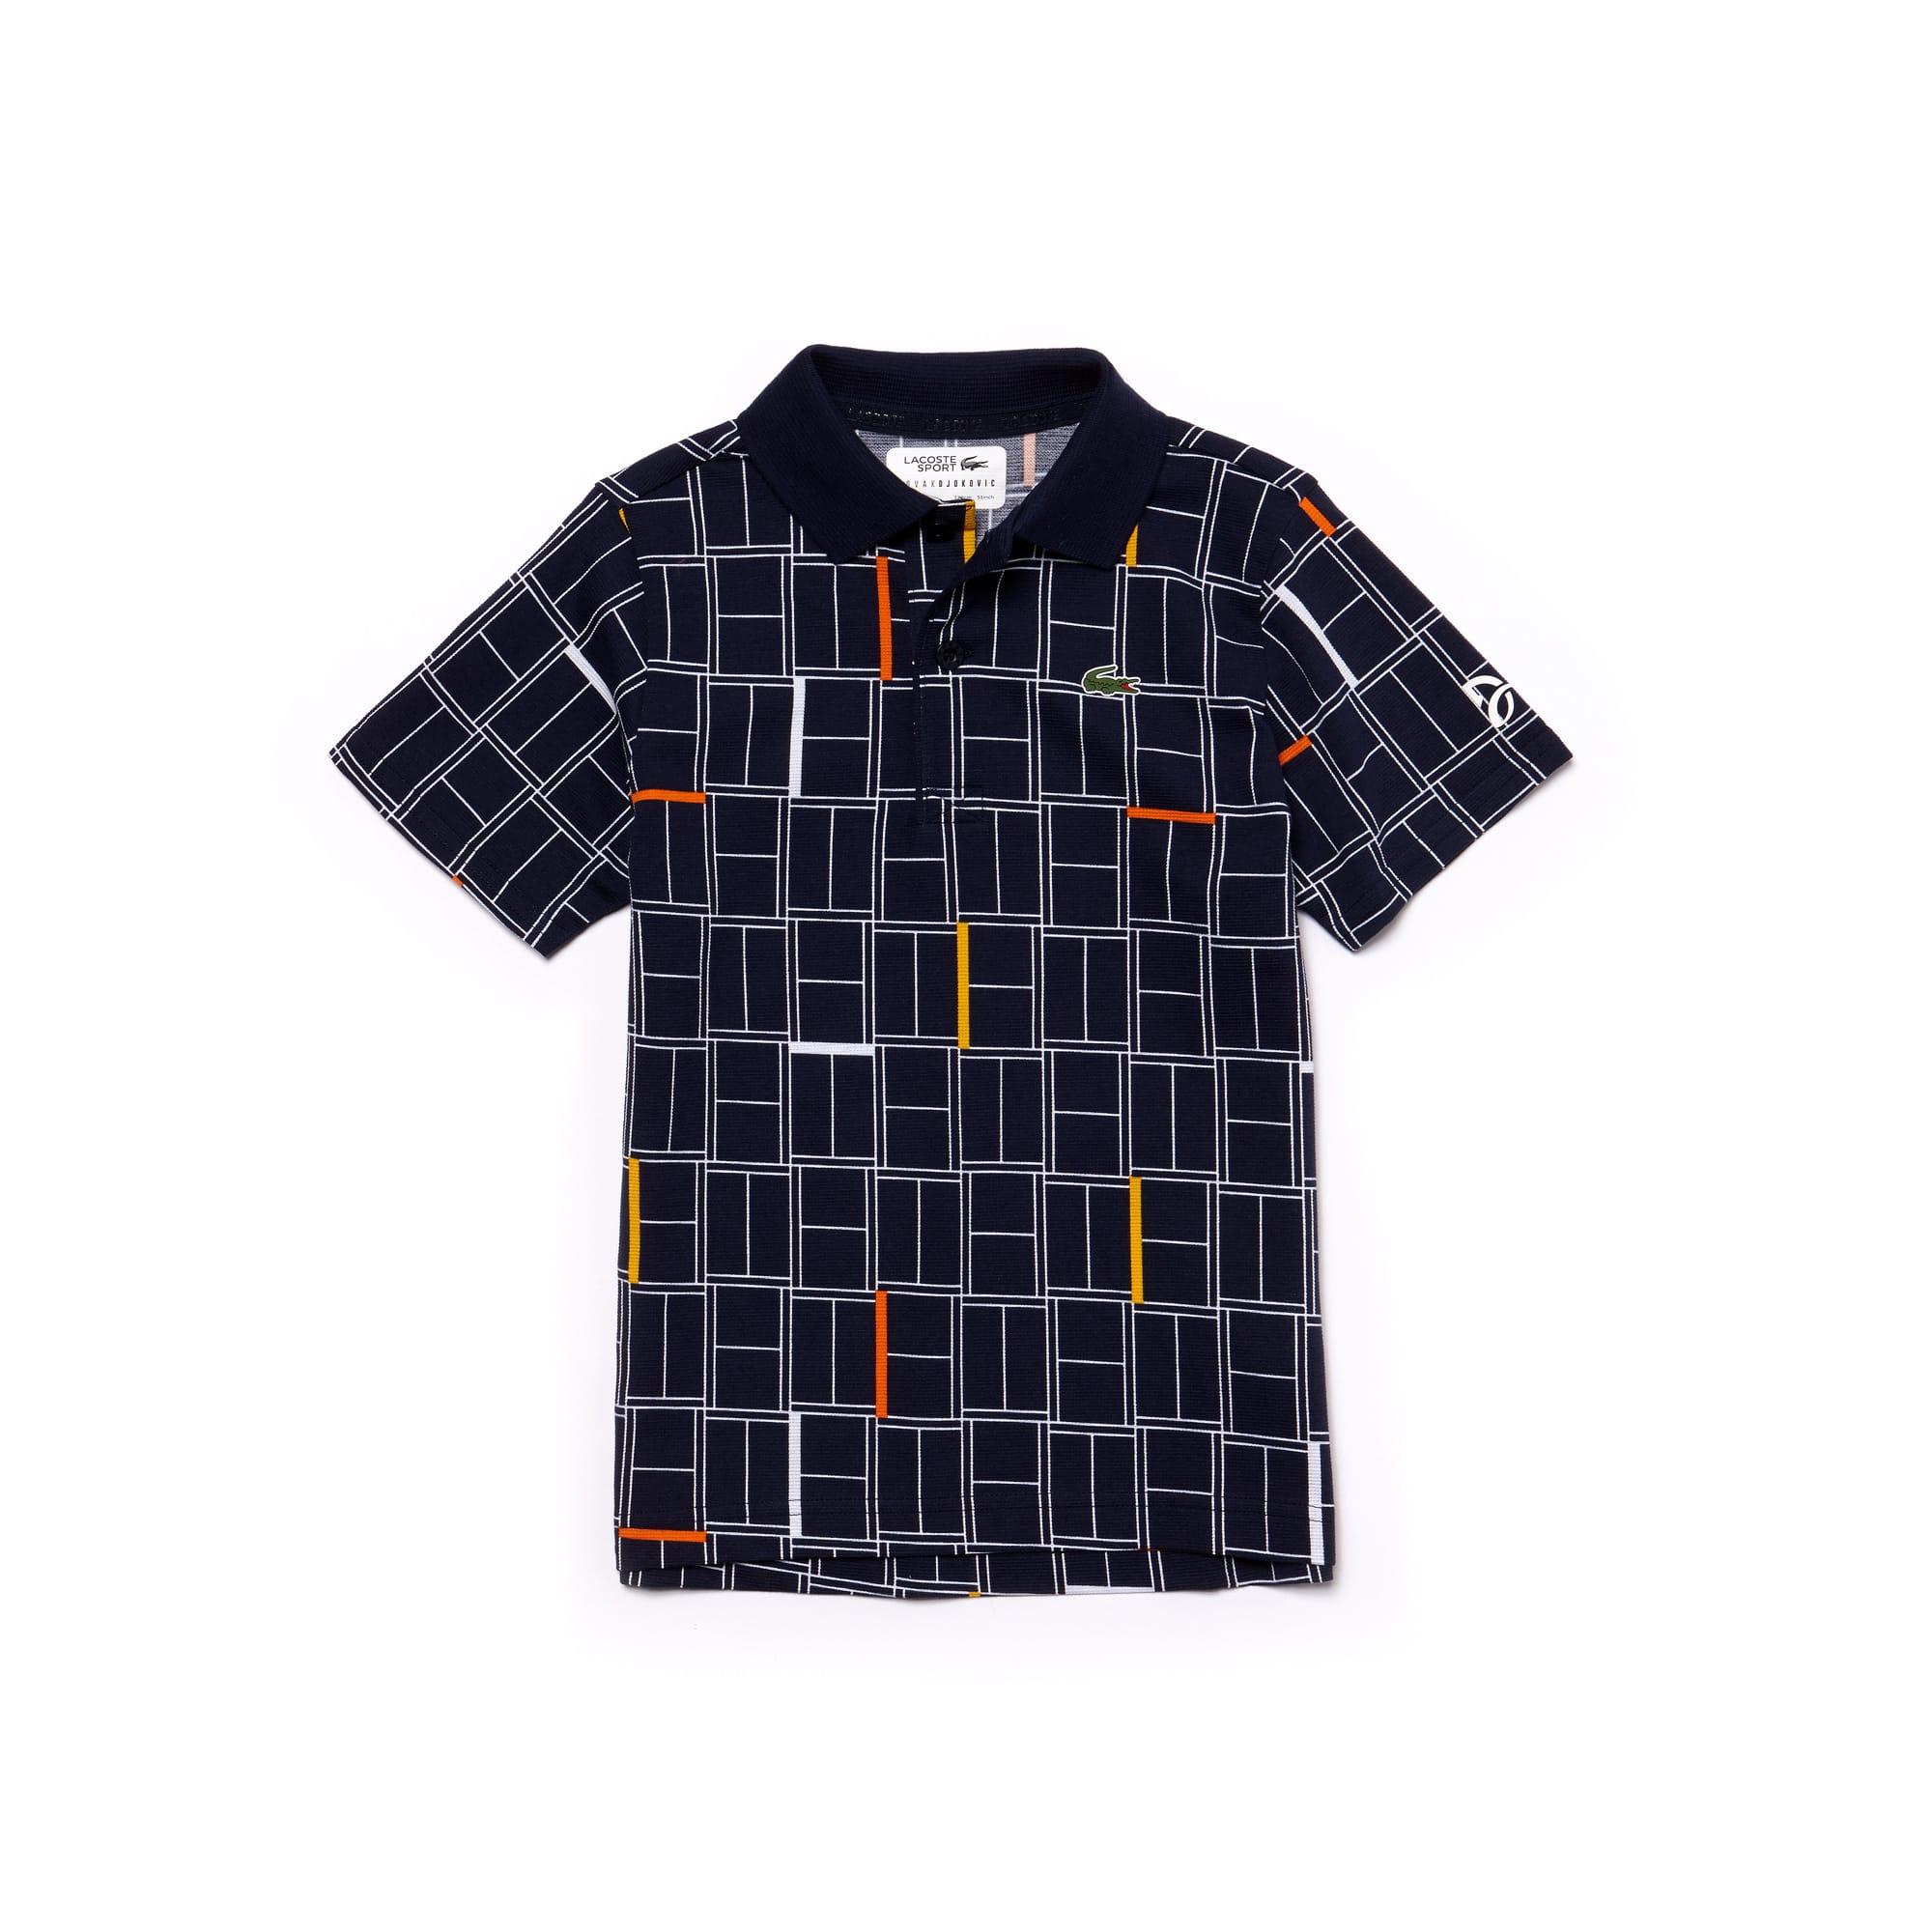 Boys' LACOSTE SPORT NOVAK DJOKOVIC COLLECTION Print Light Cotton Polo Shirt